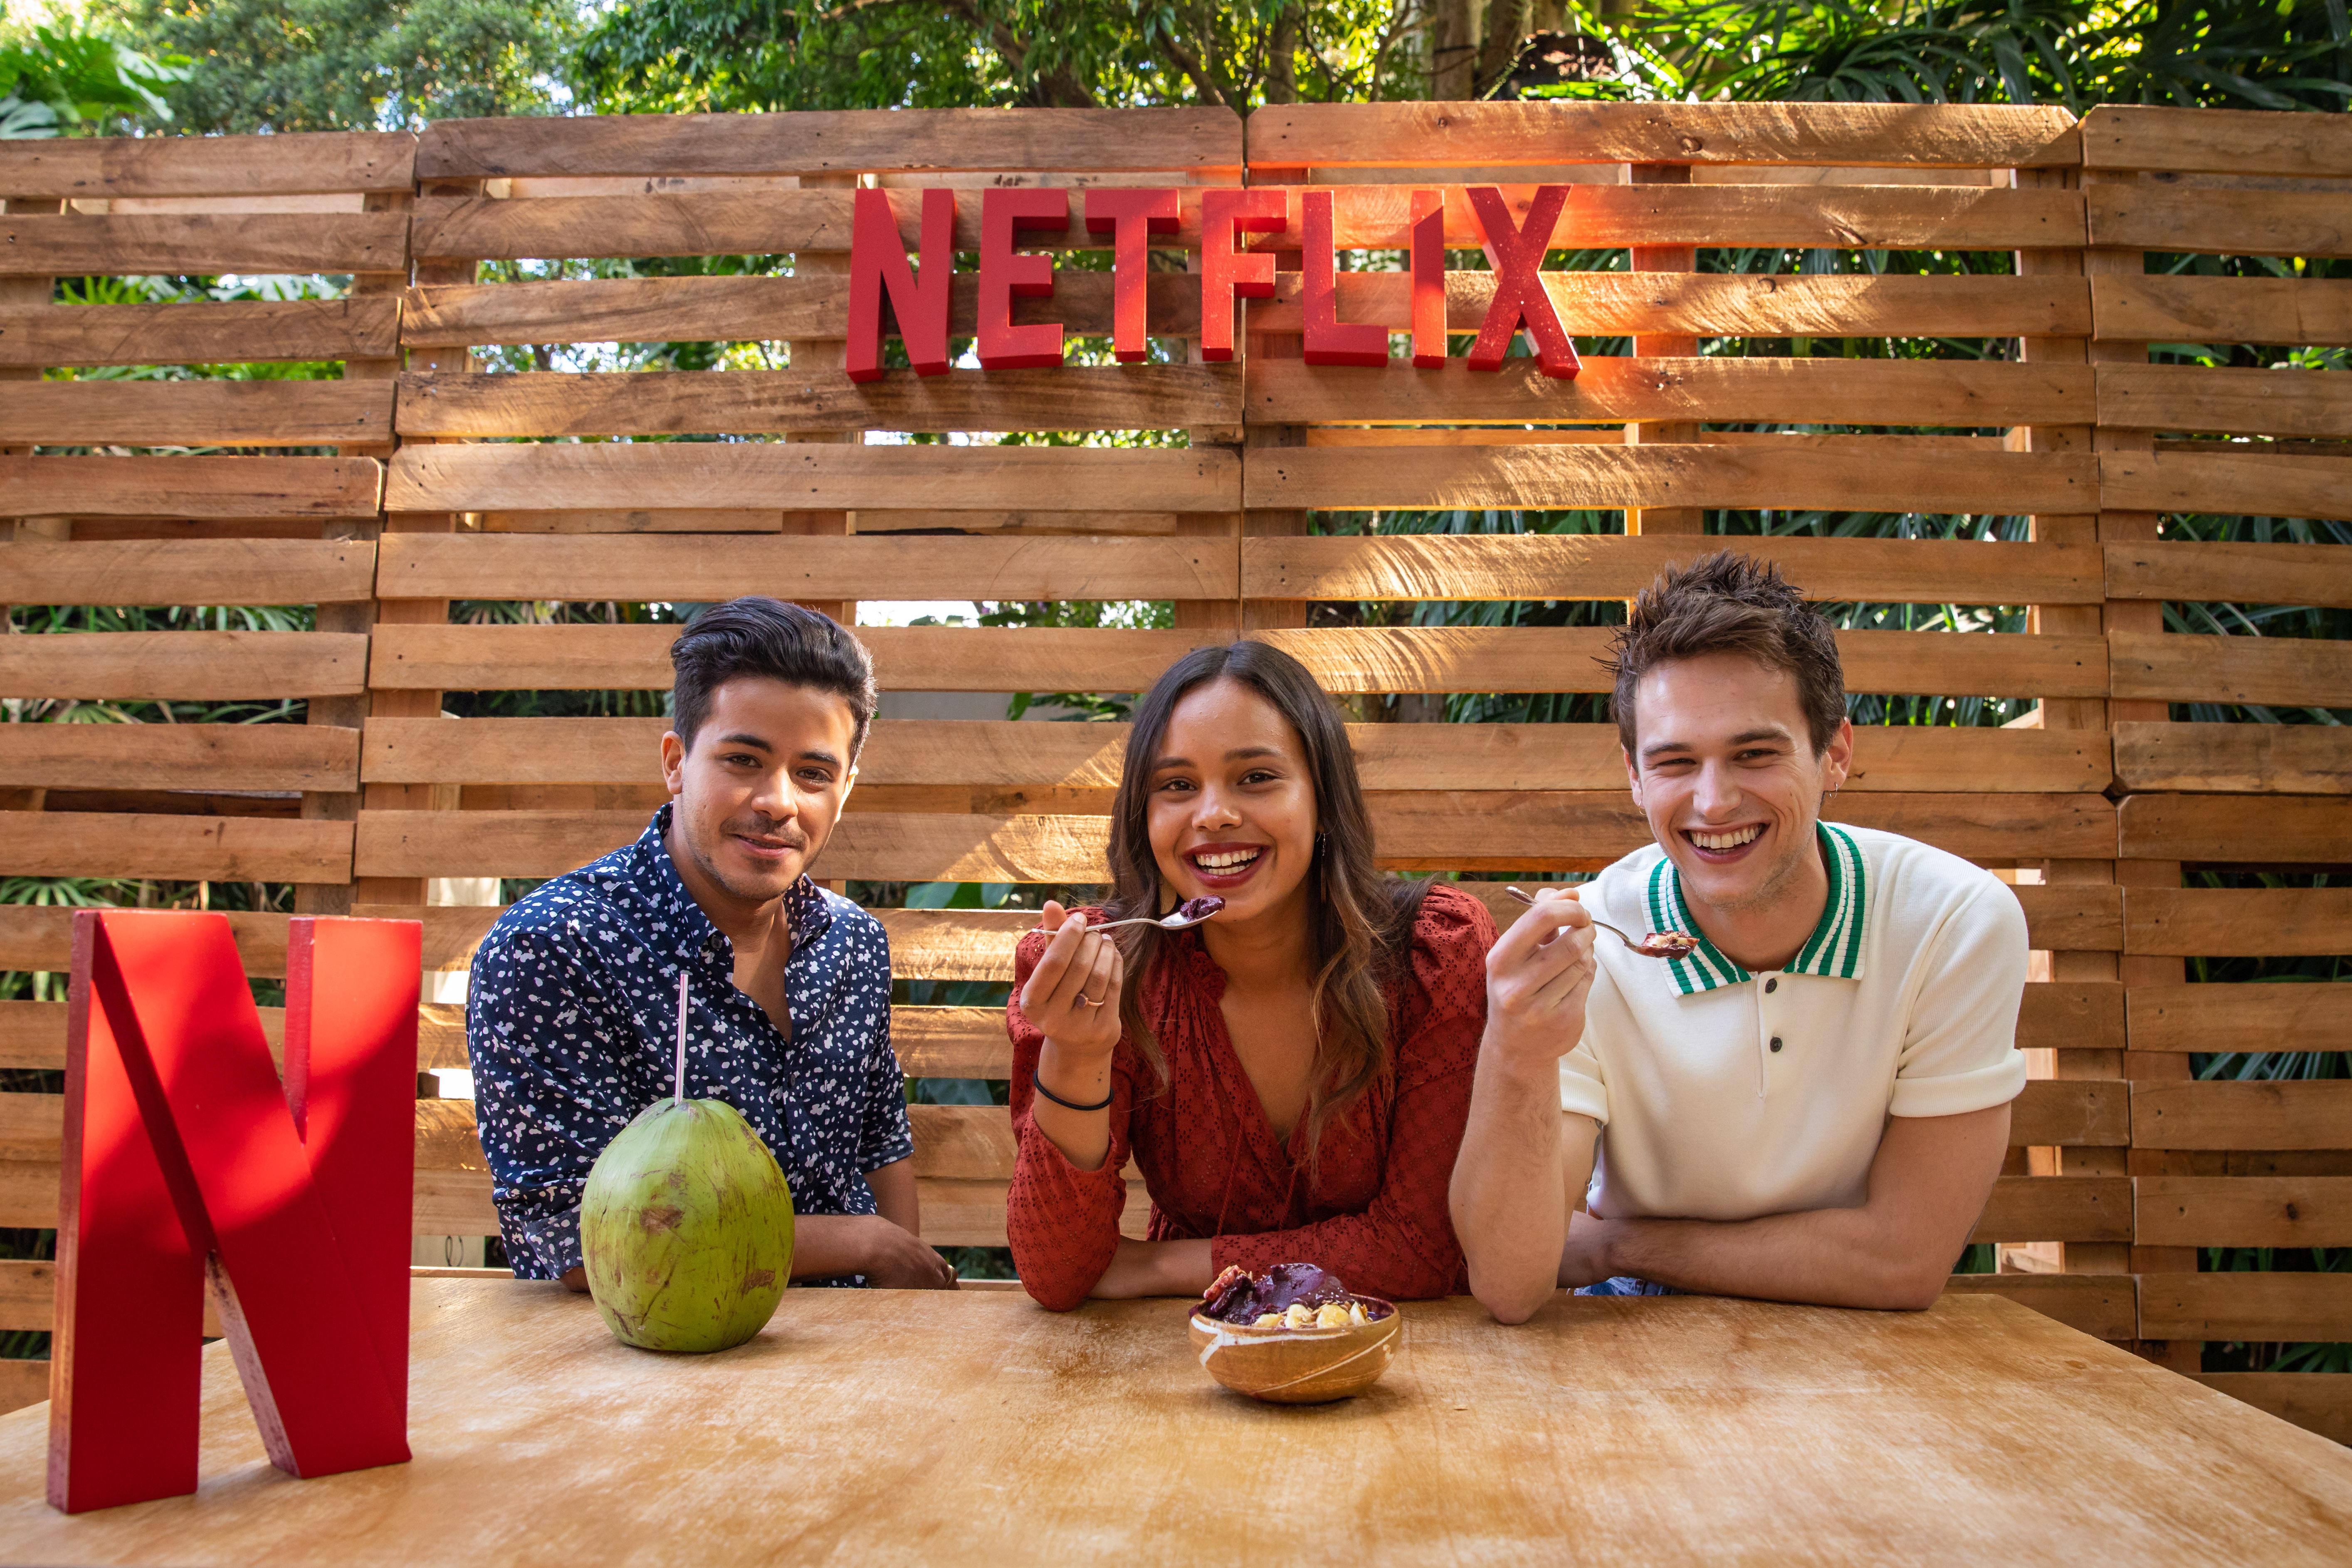 Christian Navarro, Alisha Boe e Brandon Flynn experimentaram experimentar açaí, água de coco, abacaxi e caju